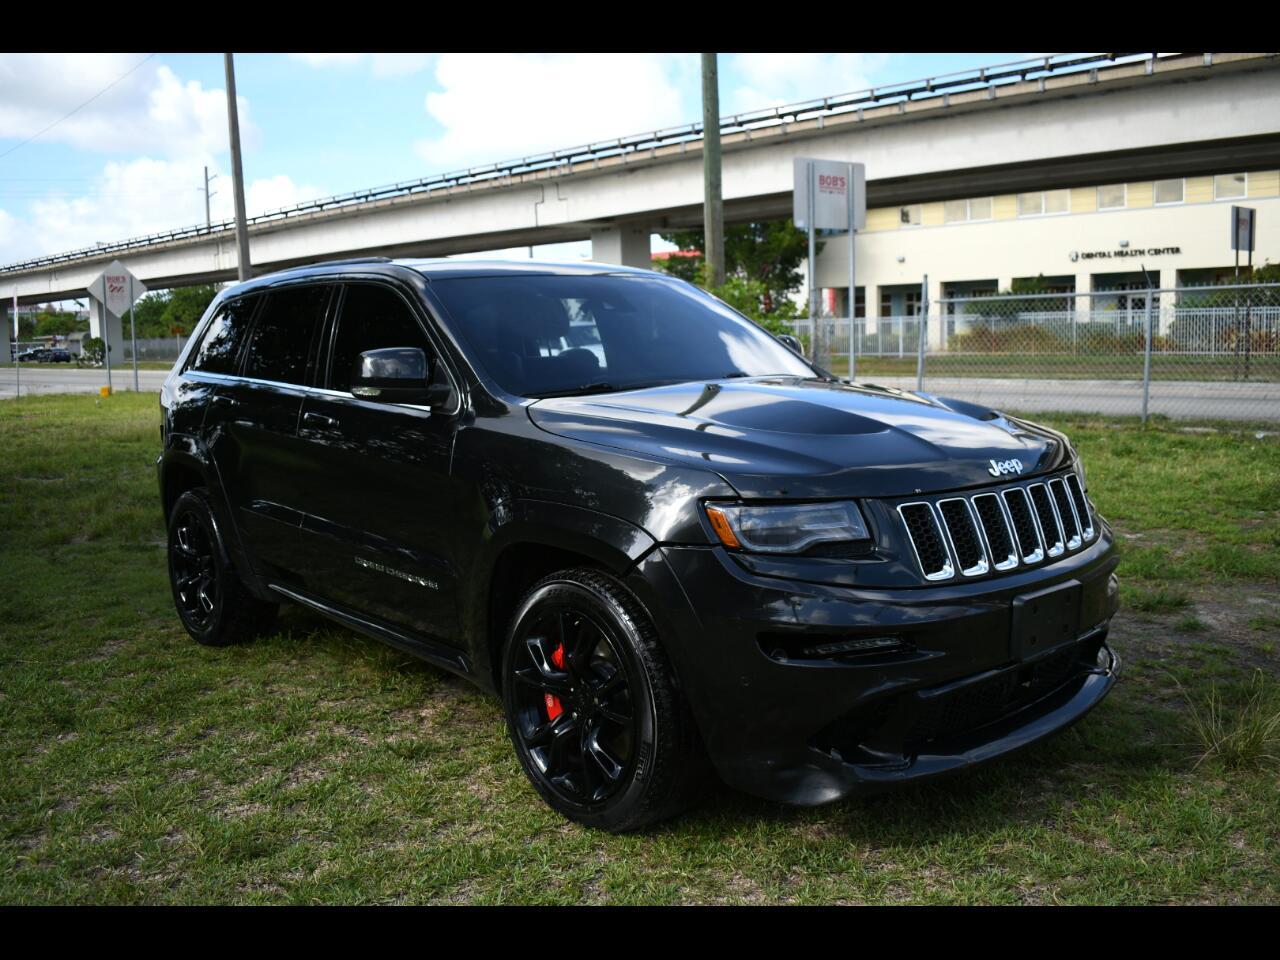 2014 Jeep Grand Cherokee SRT8 4WD